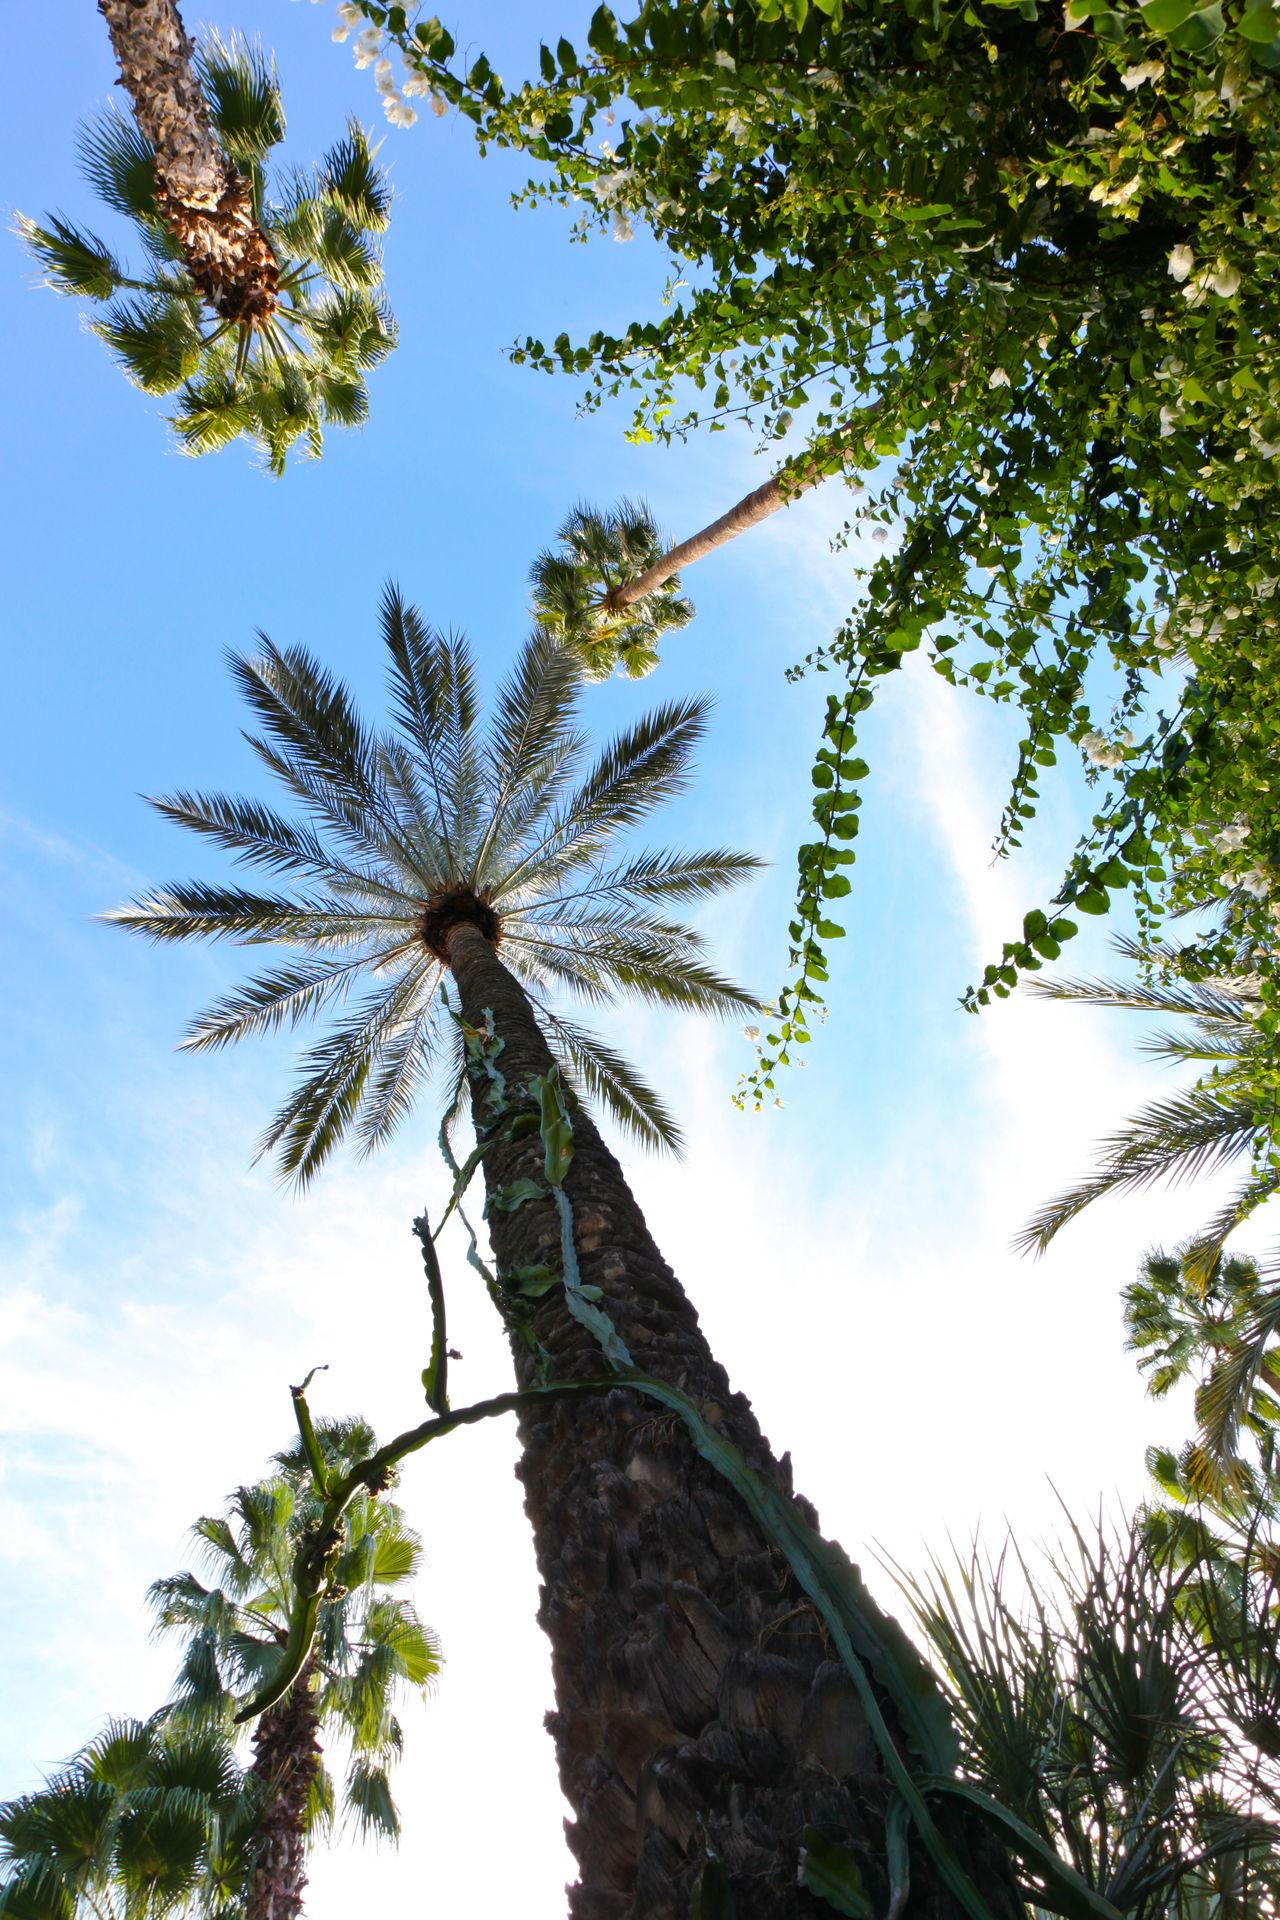 Up Greenery Lush Exotic Palm Tree Tree Shrub Vine Towering Foliage Flora Undergrowth Hot Blue Sky Maroc Morocco Marrakesh Marrakech Garden Nature Majorelle